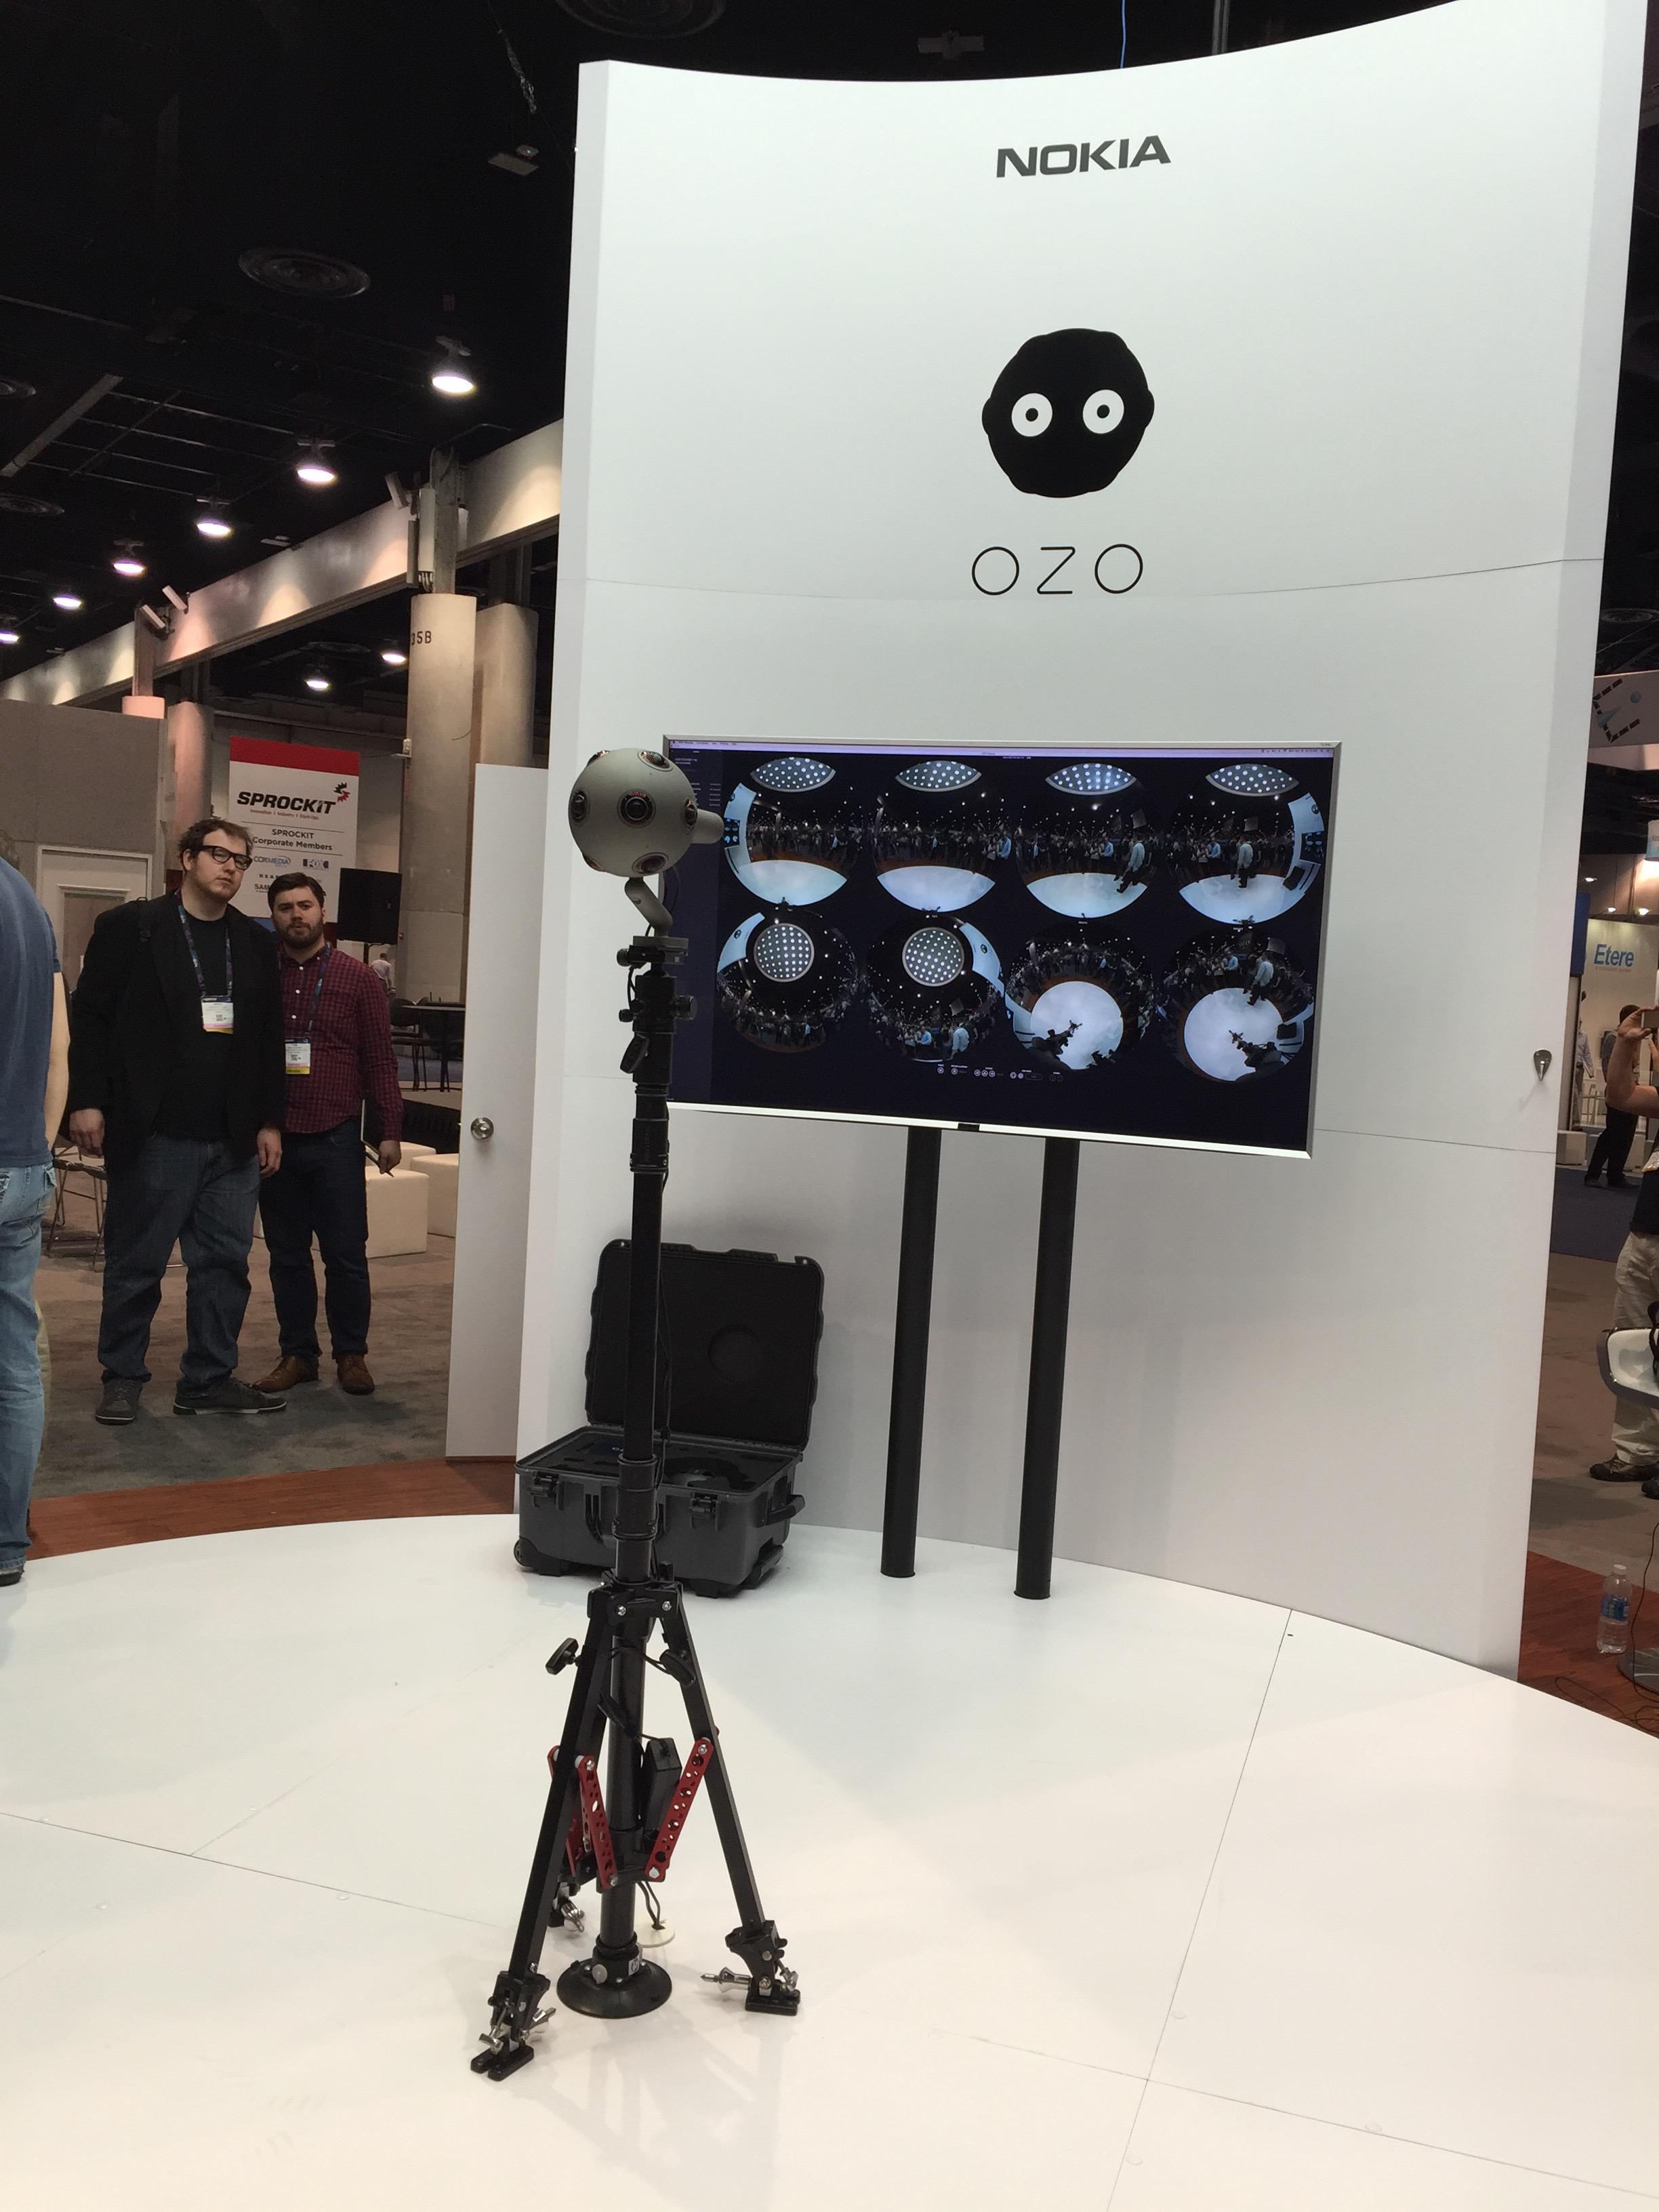 Nokia's OZO 360 VR camera with 360 sound recording capabilities.